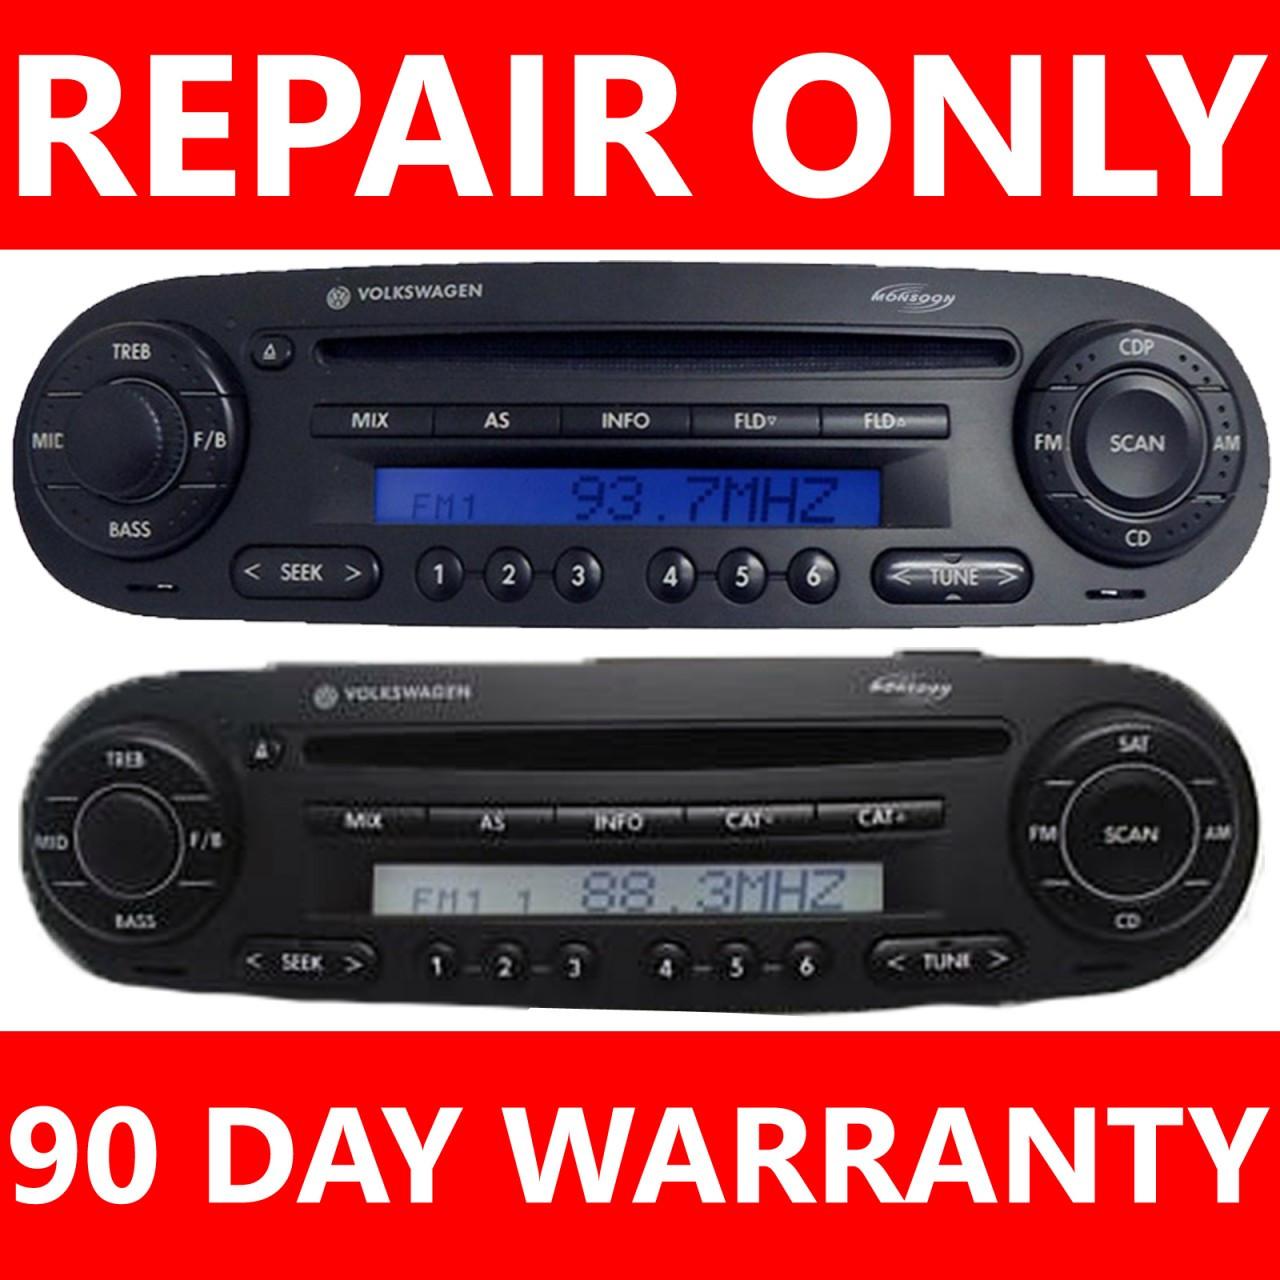 98 10 Volkswagen Beetle Single Disc Changer Player Cd Player